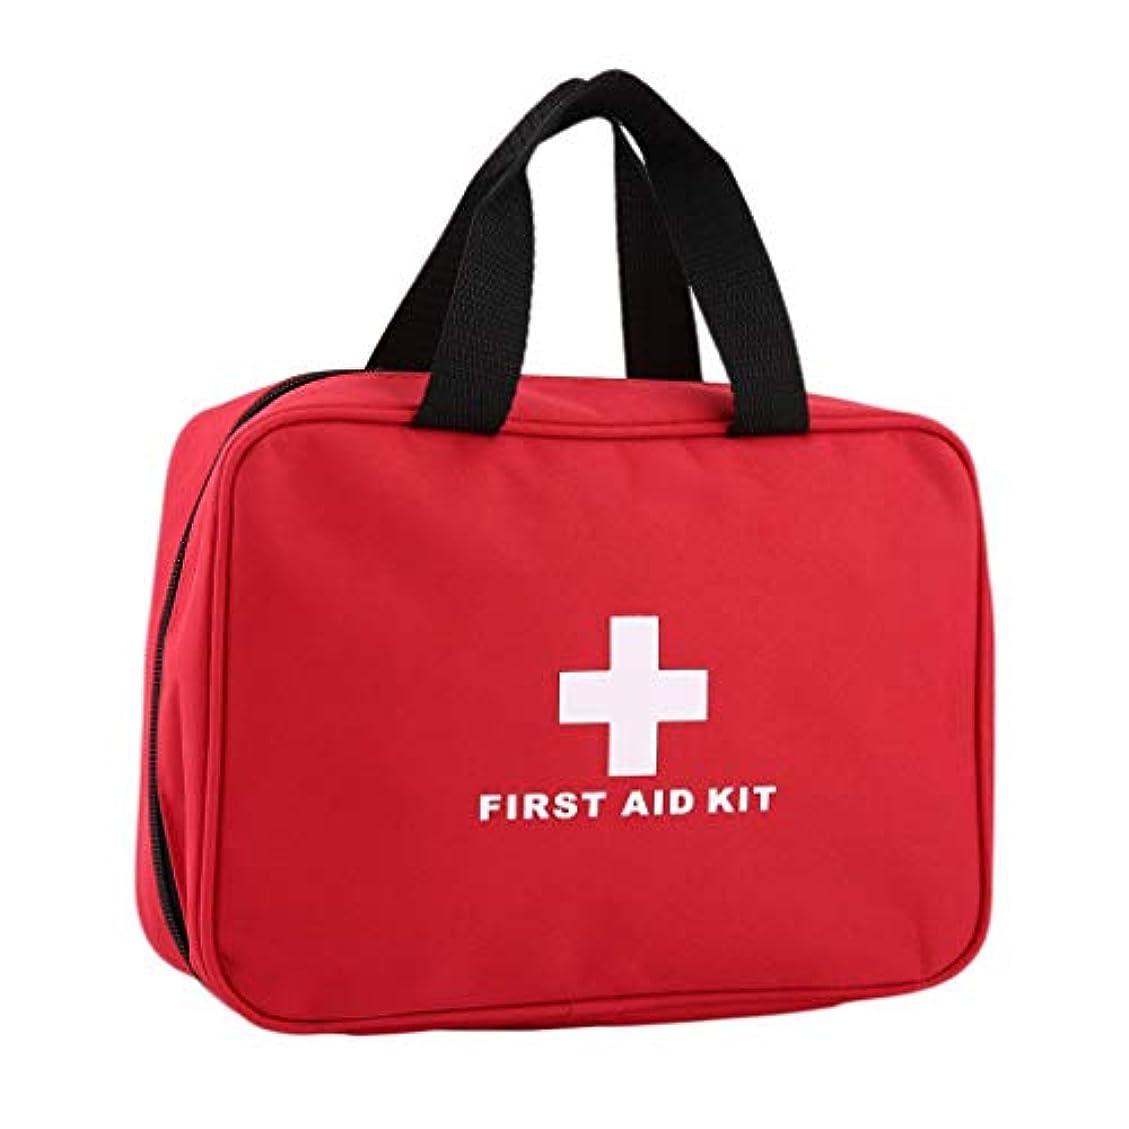 XKJPShop 救急箱 応急処置キット大きな車応急処置キット大型屋外緊急キットバッグ旅行キャンプサバイバル医療キット 応急処置ケース、家庭、職場、学校